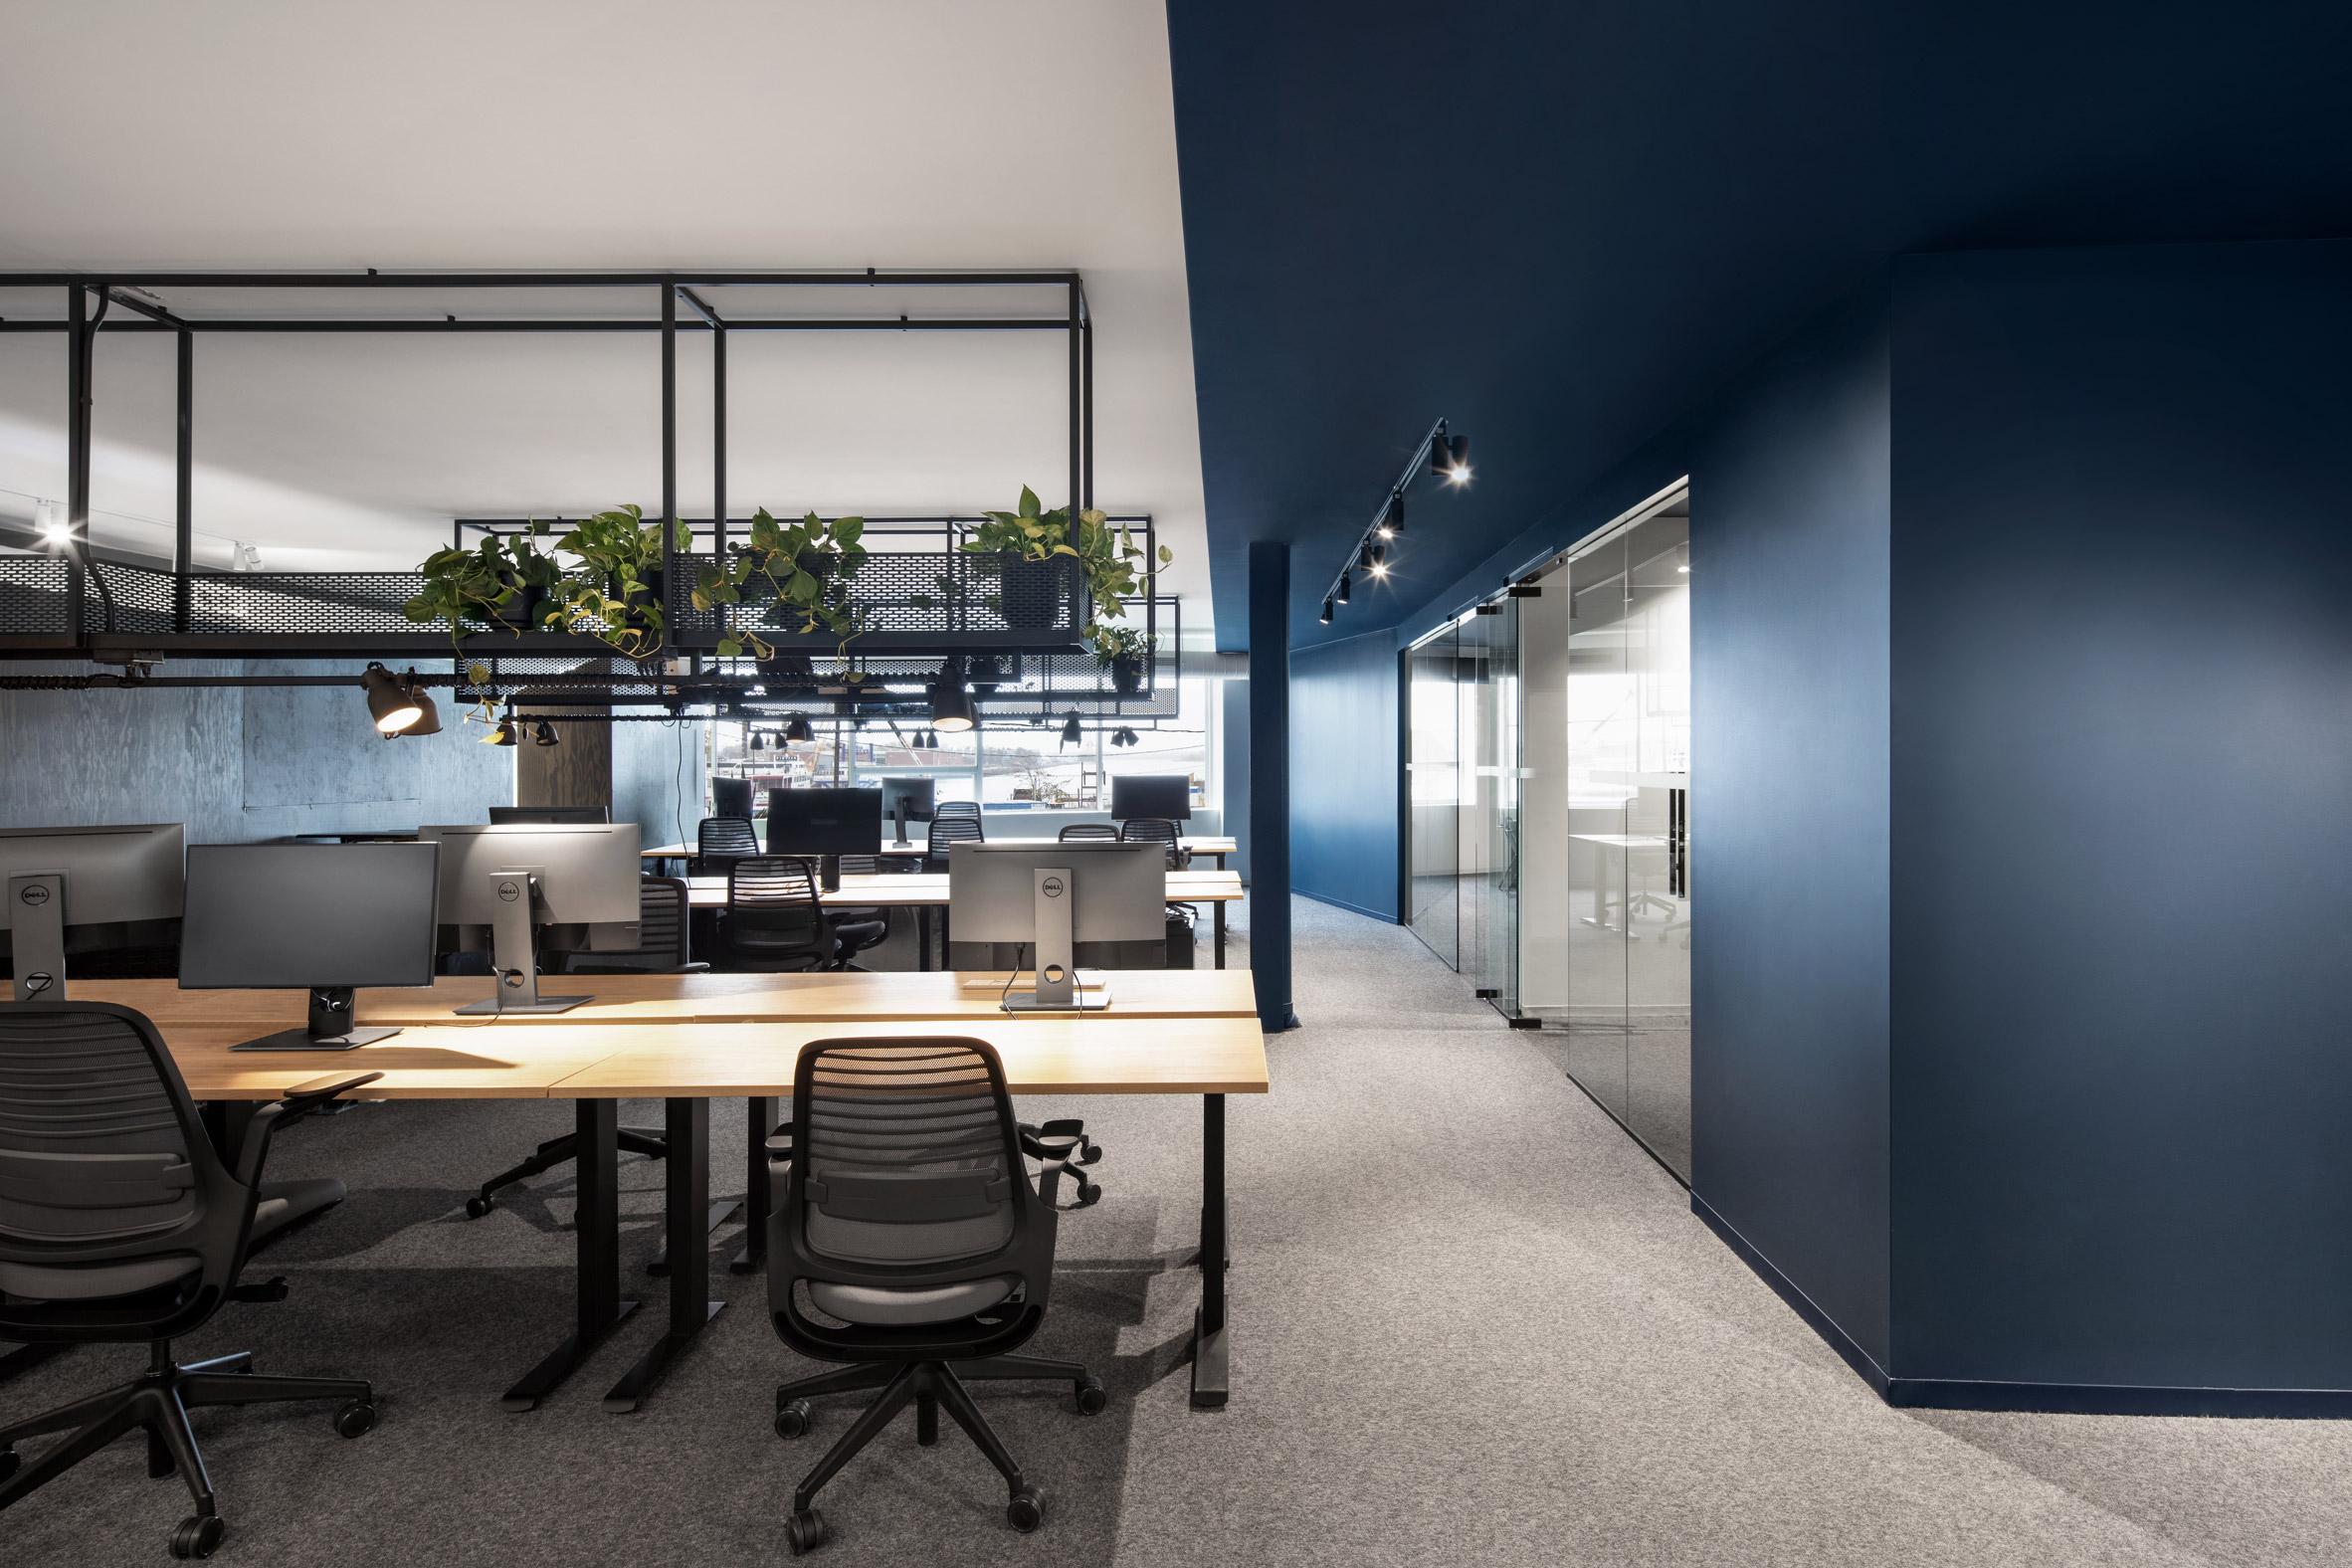 Sidewalk Labs office by Lebel and Bouliane